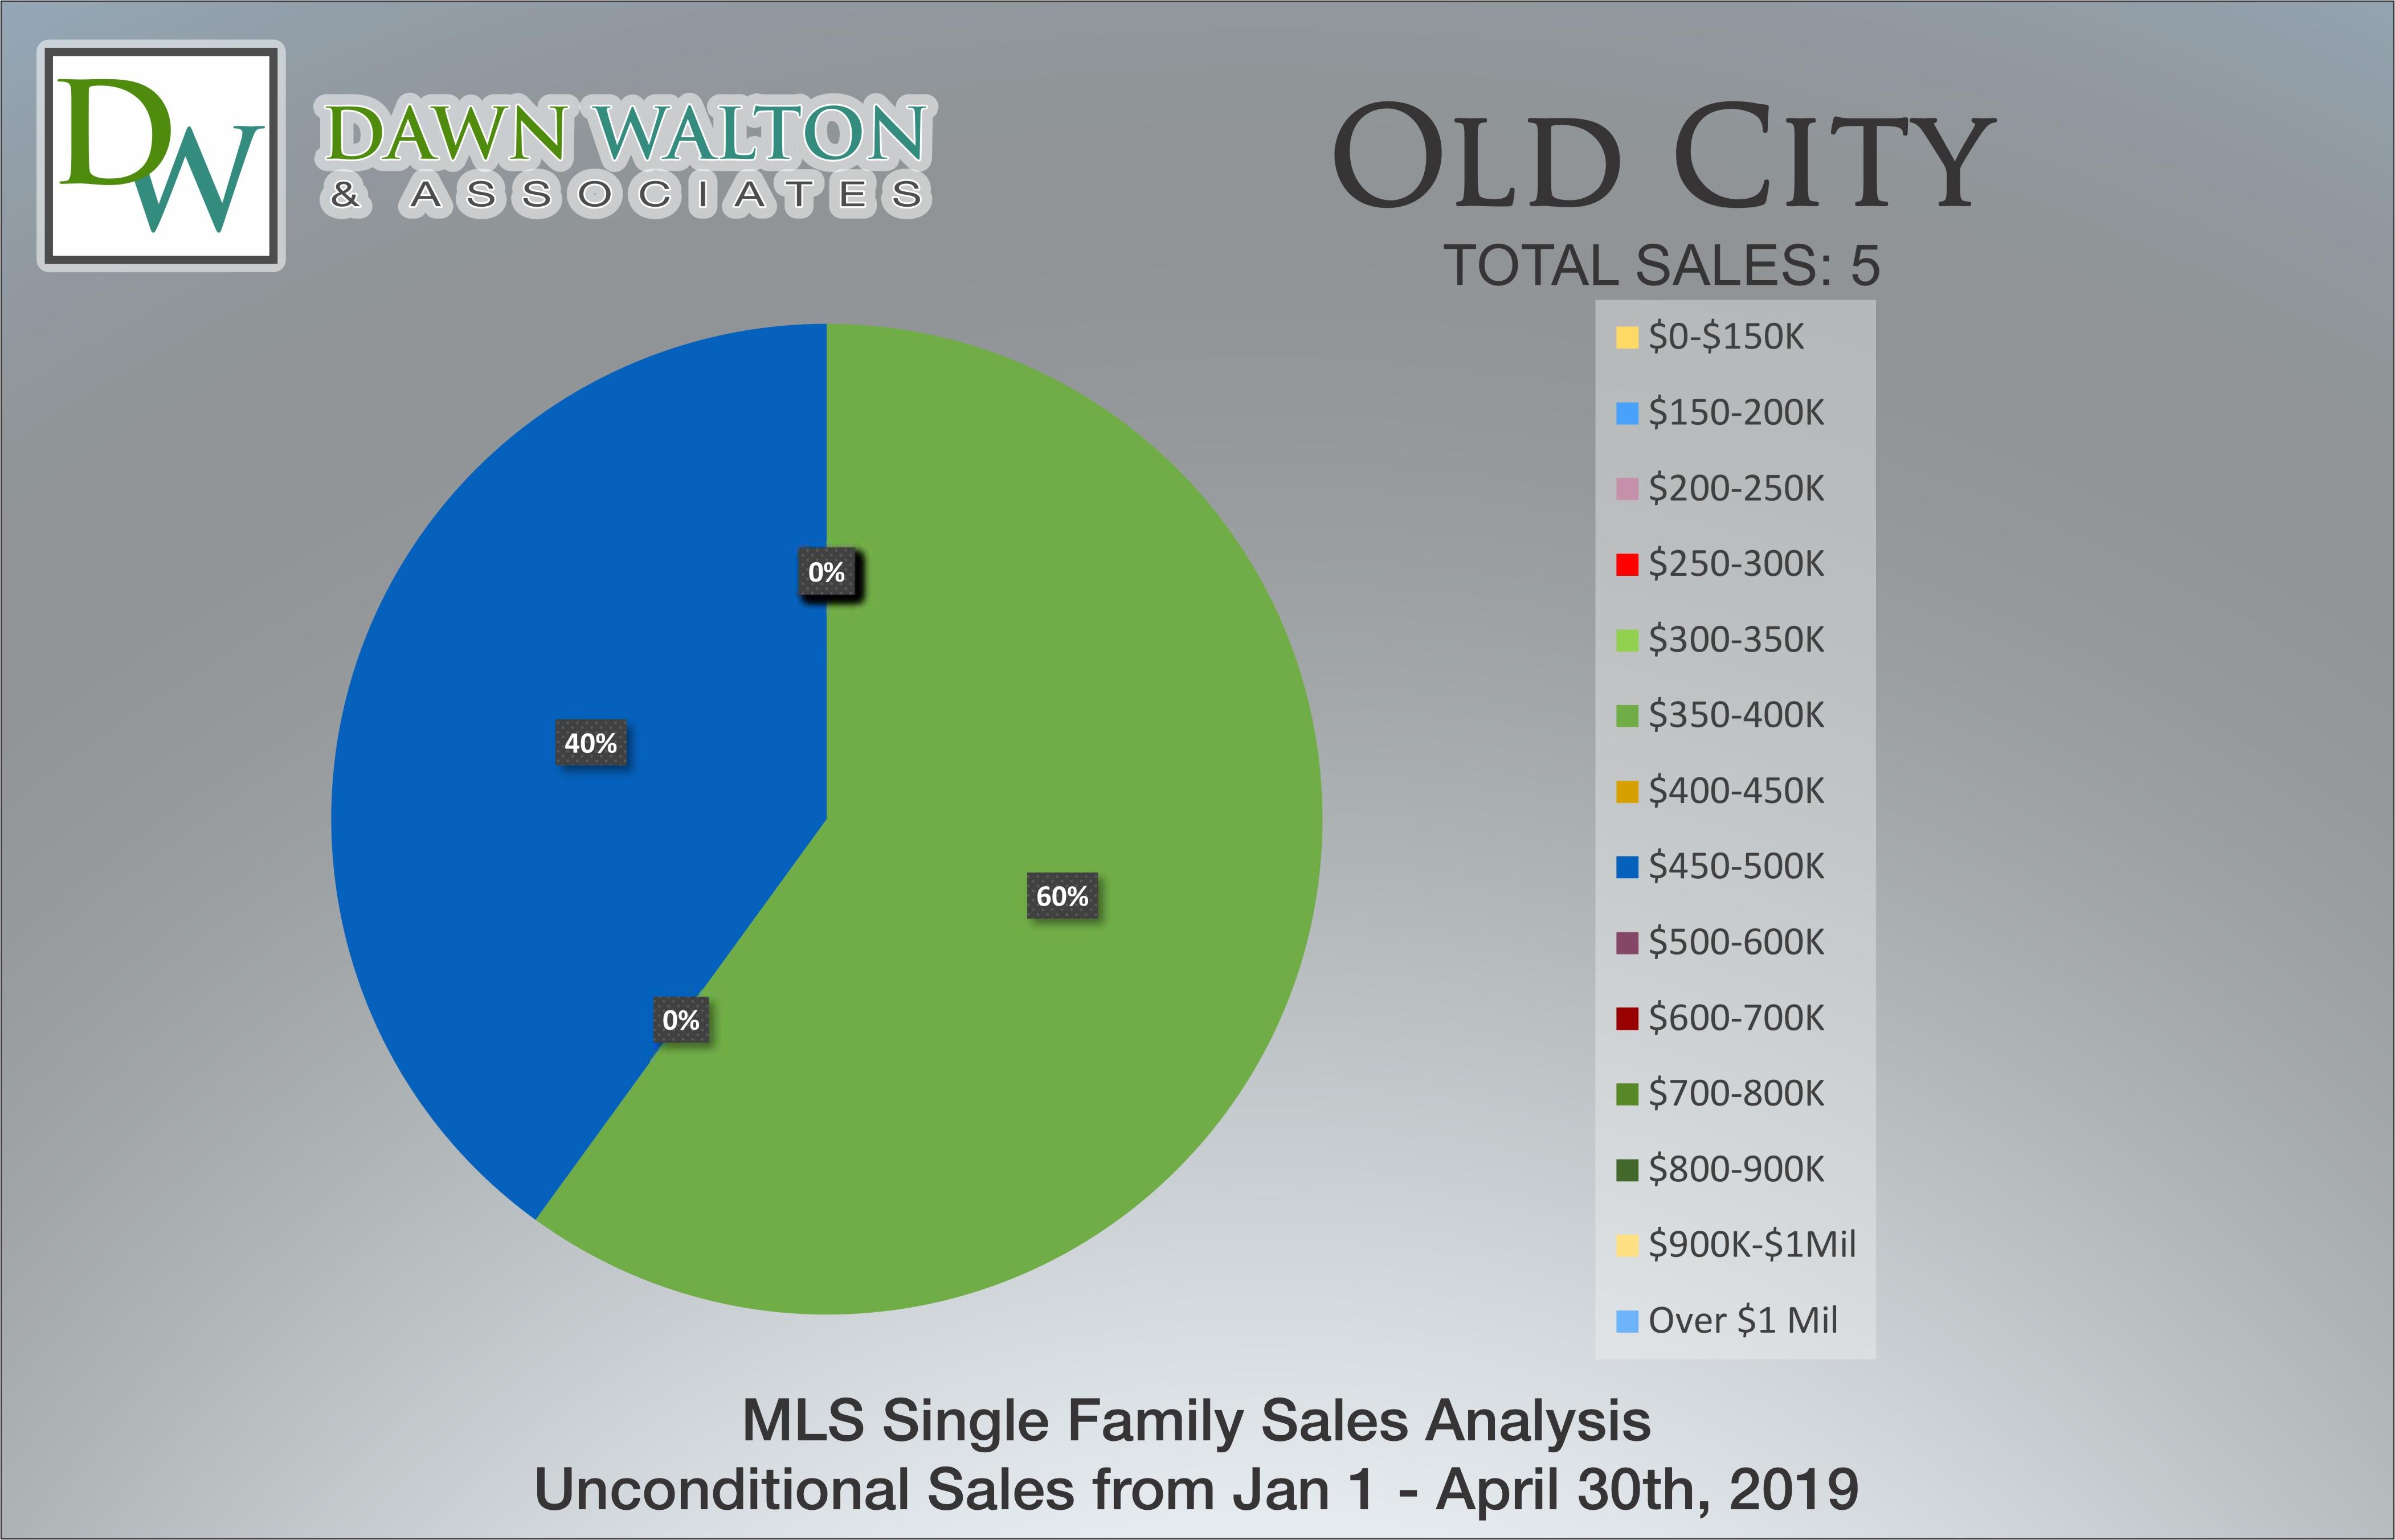 Old City Real Estate Market Stats Price Percentage Jan 1 - April 30, 2019 - Nanaimo Realtor Dawn Walton